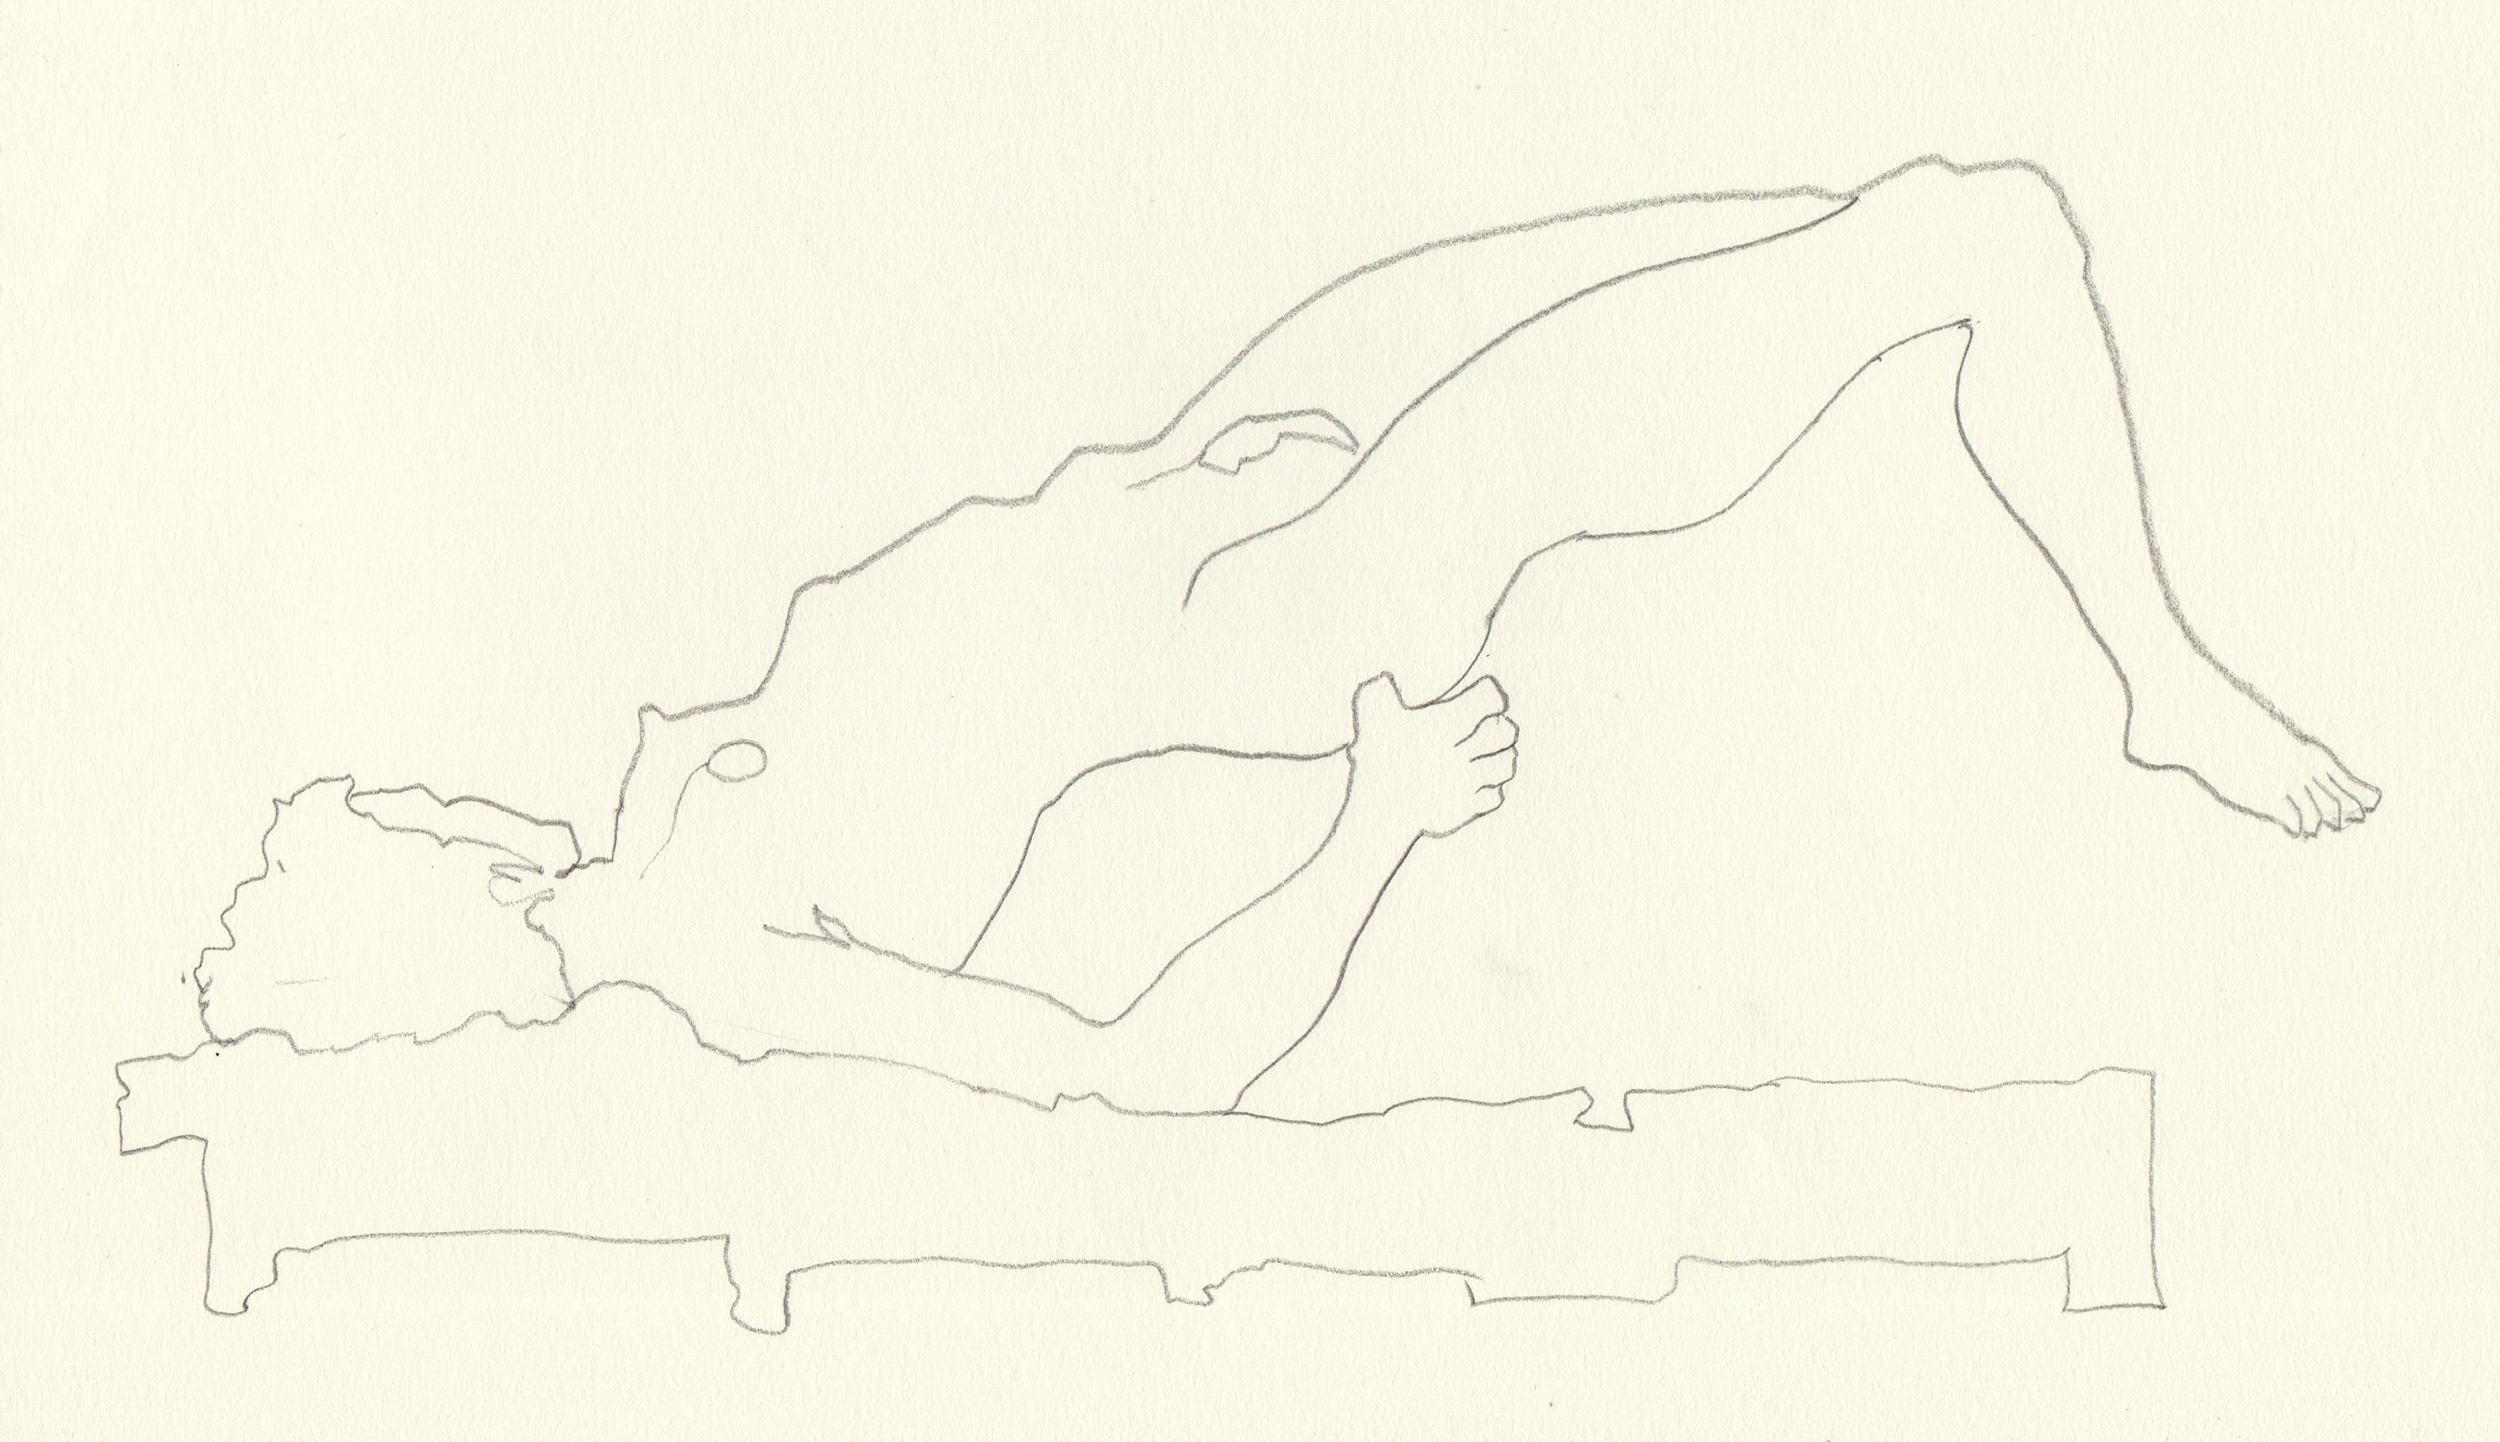 2012_Sketch_F-Beudin_041